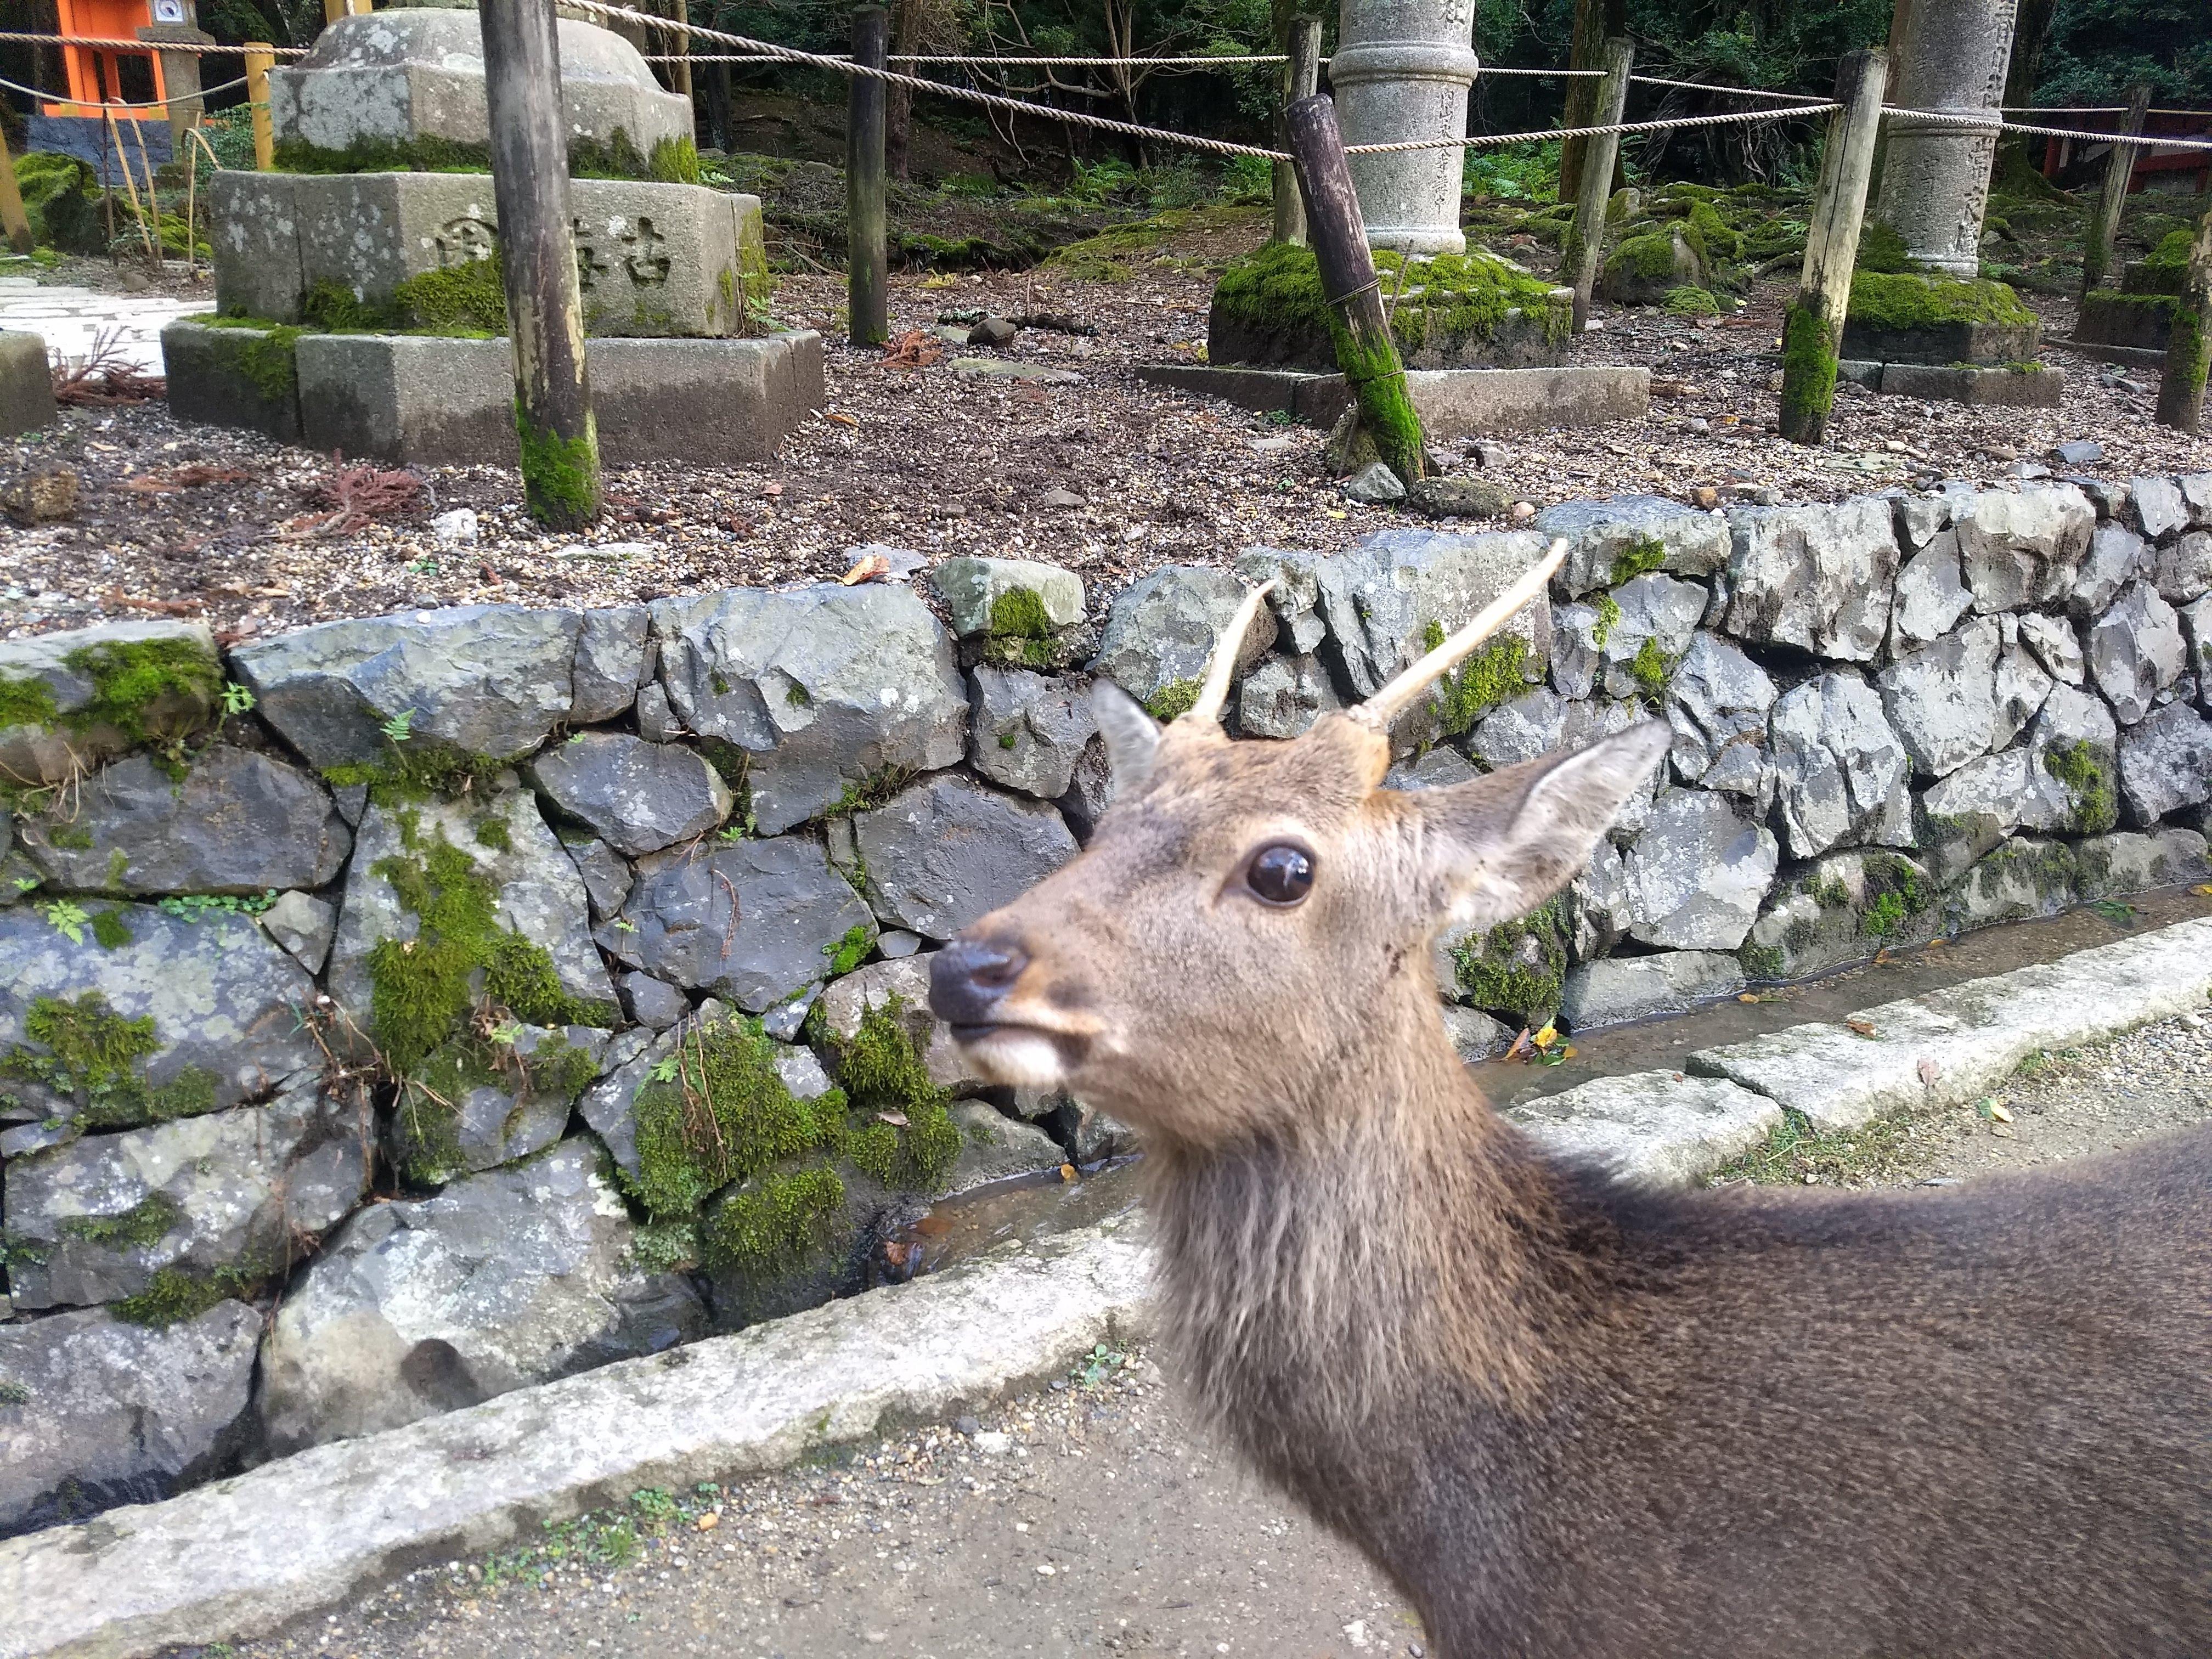 Buck at Nara Deer Park - 10-26-2019